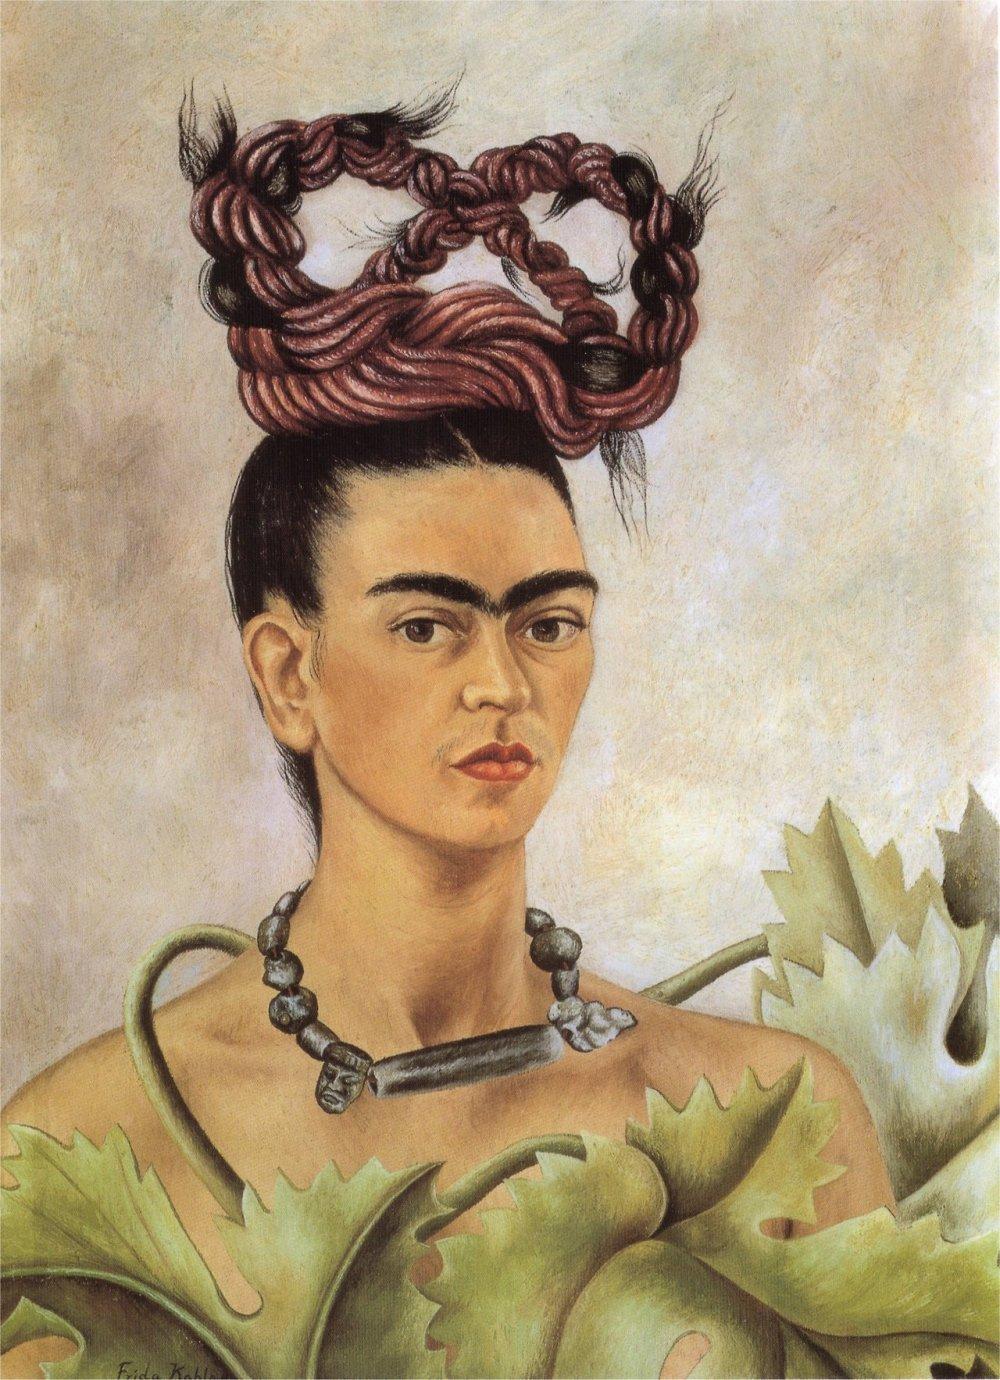 frida-kahlo-self-portrait-with-braid-1941.jpg